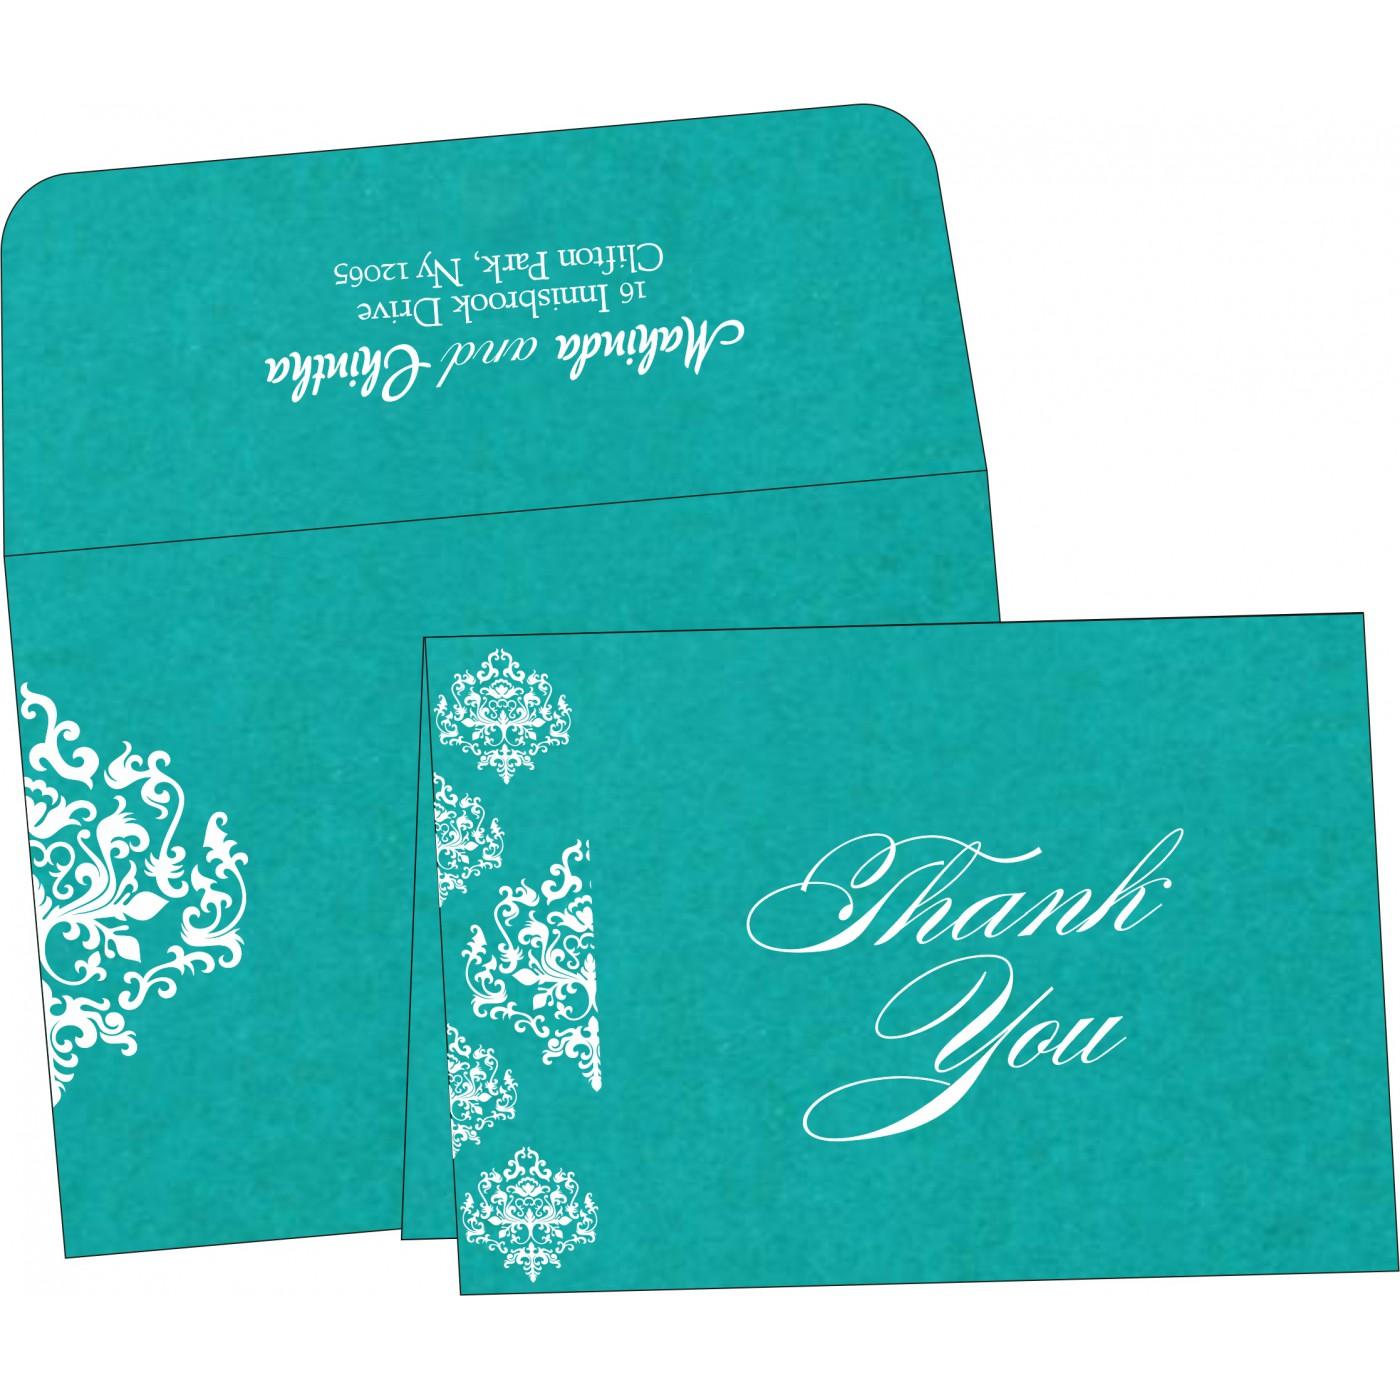 Thank You Cards - TYC-8254E